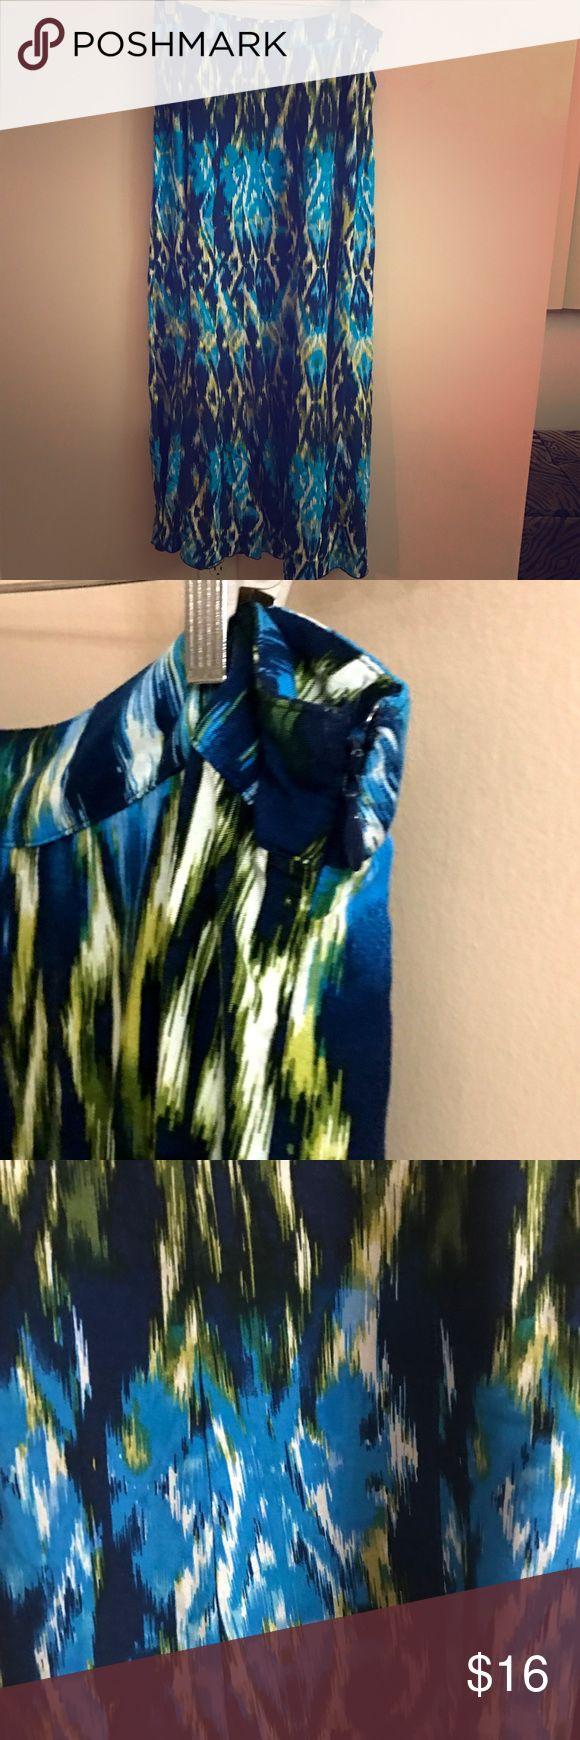 Blue & Green Aztec Design Long Maxi Skirt small Blue, White & Green Aztec Design Long Maxi Skirt size small like new Apt. 9 Skirts Maxi